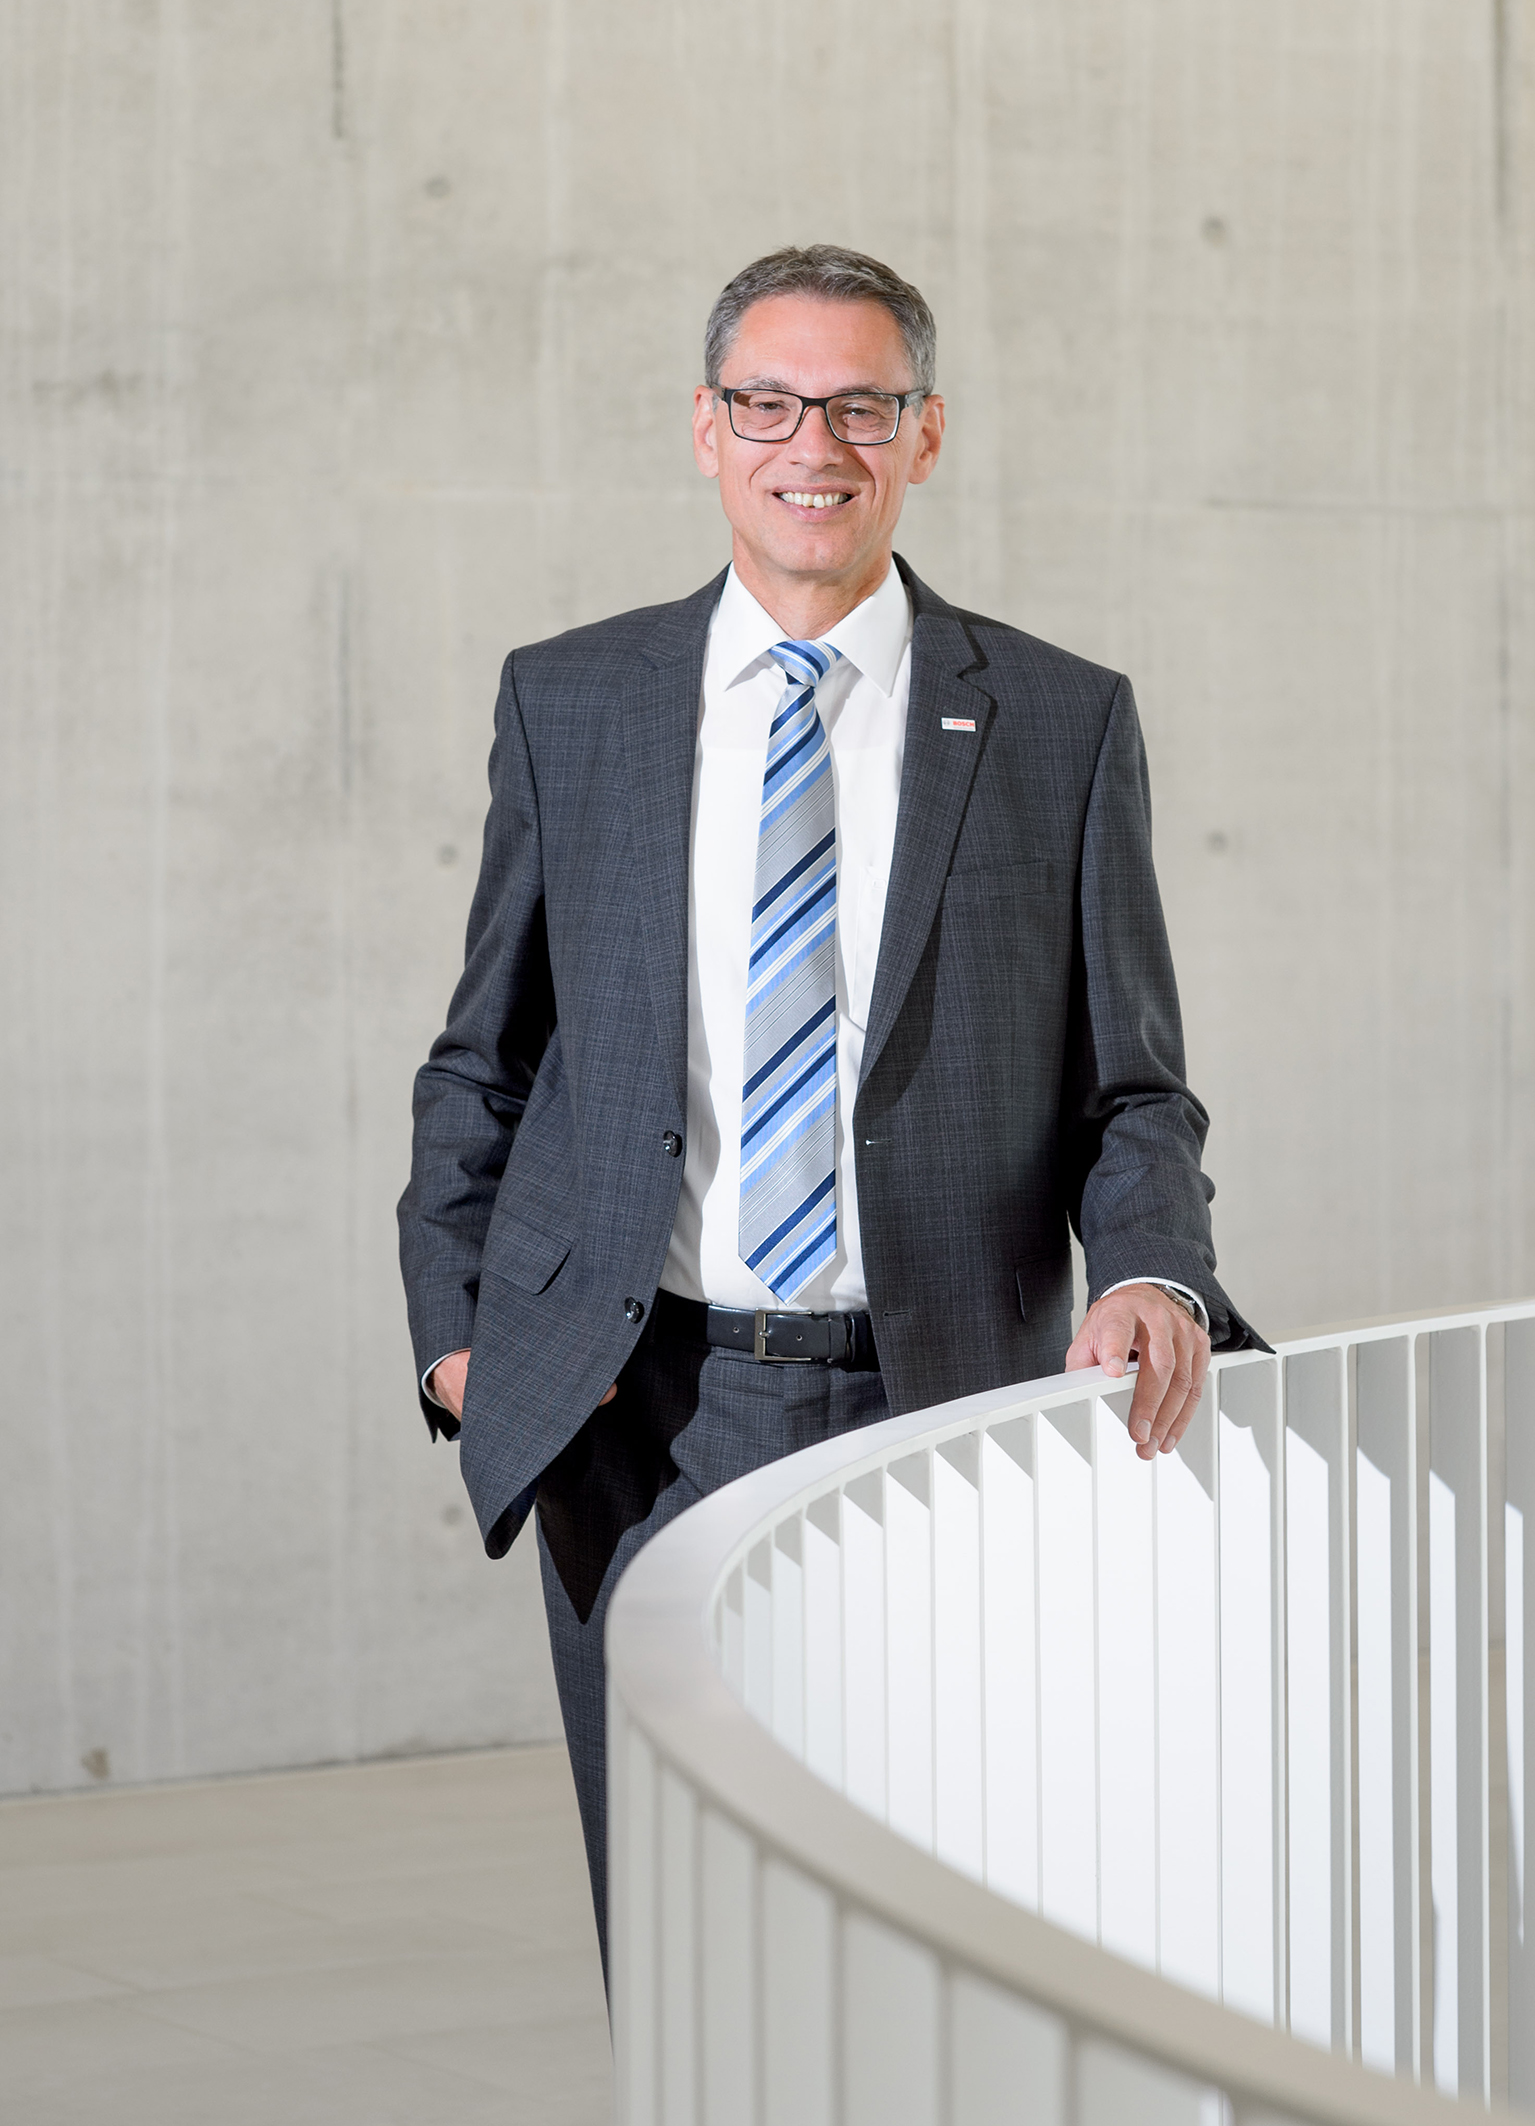 Bosch research: Dr. Jürgen Kirschner